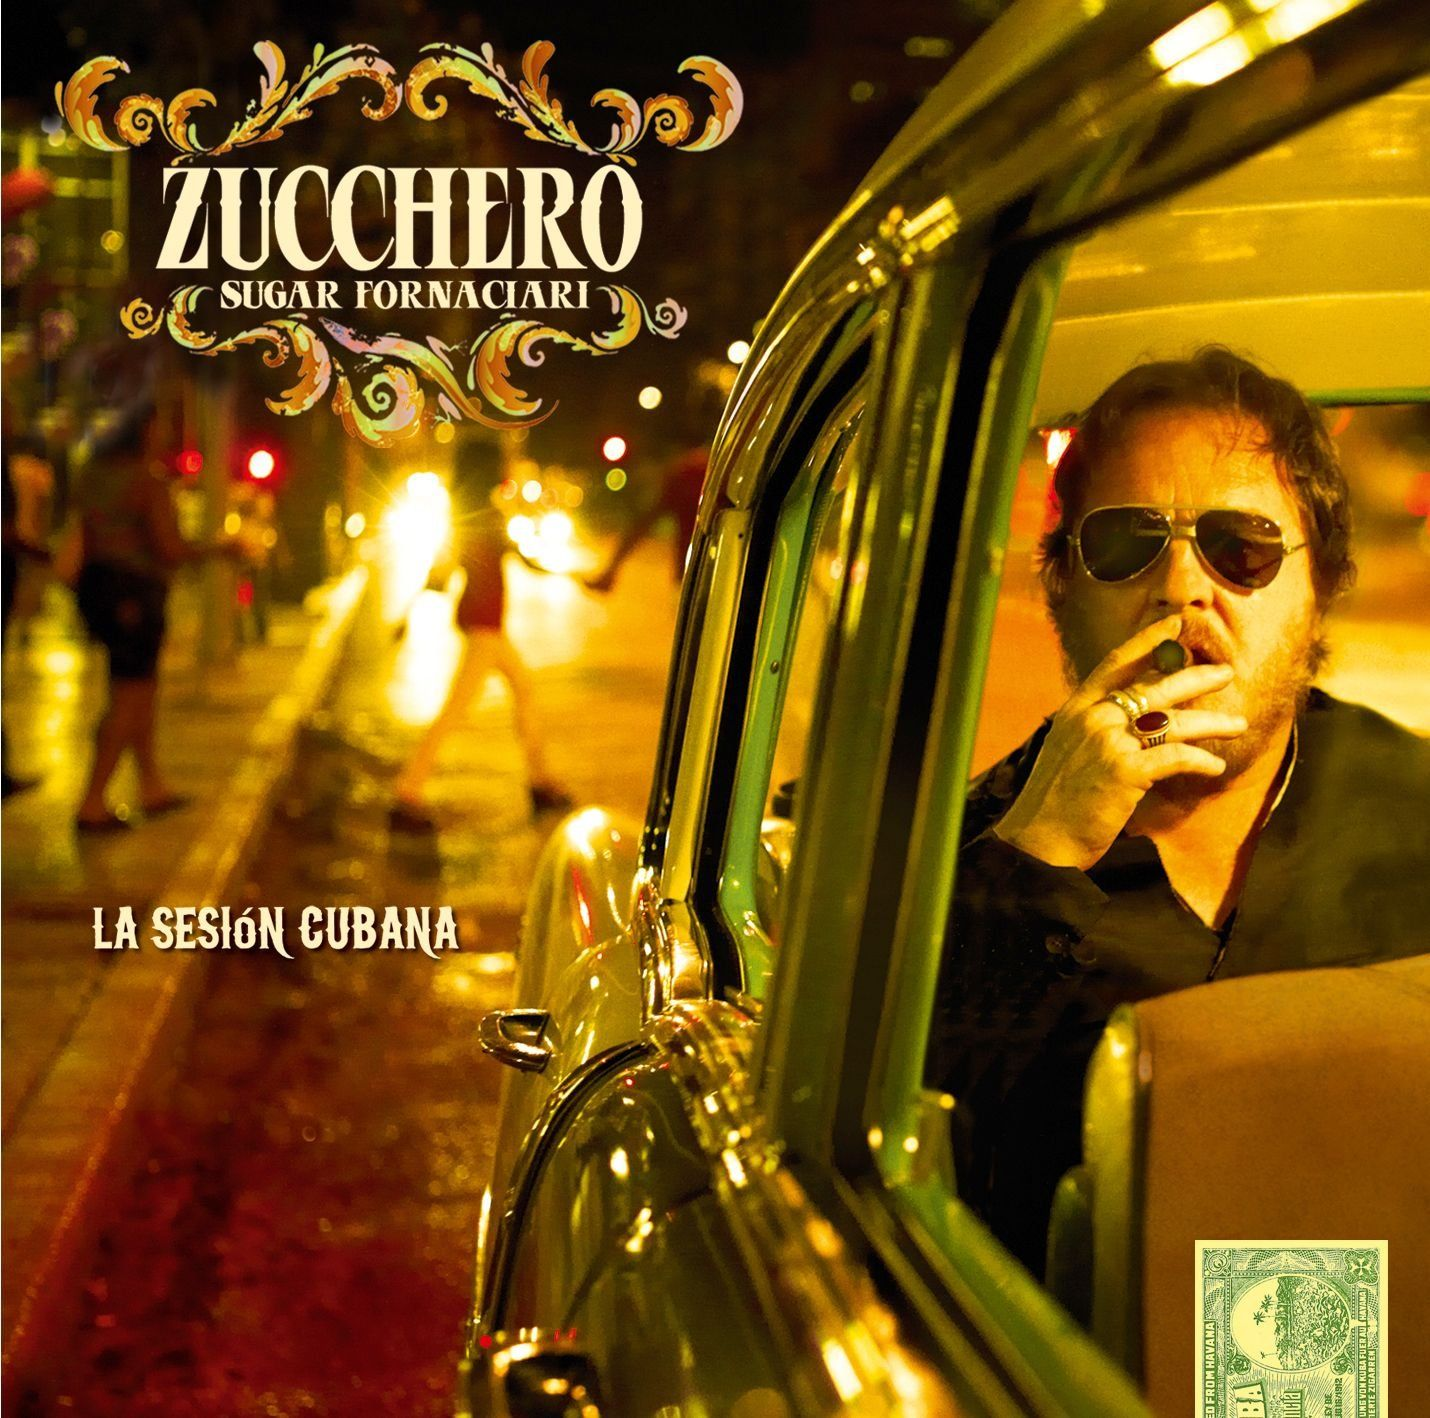 Zucchero 'Sugar' Fornaciari - La Sesión Cubana album cover